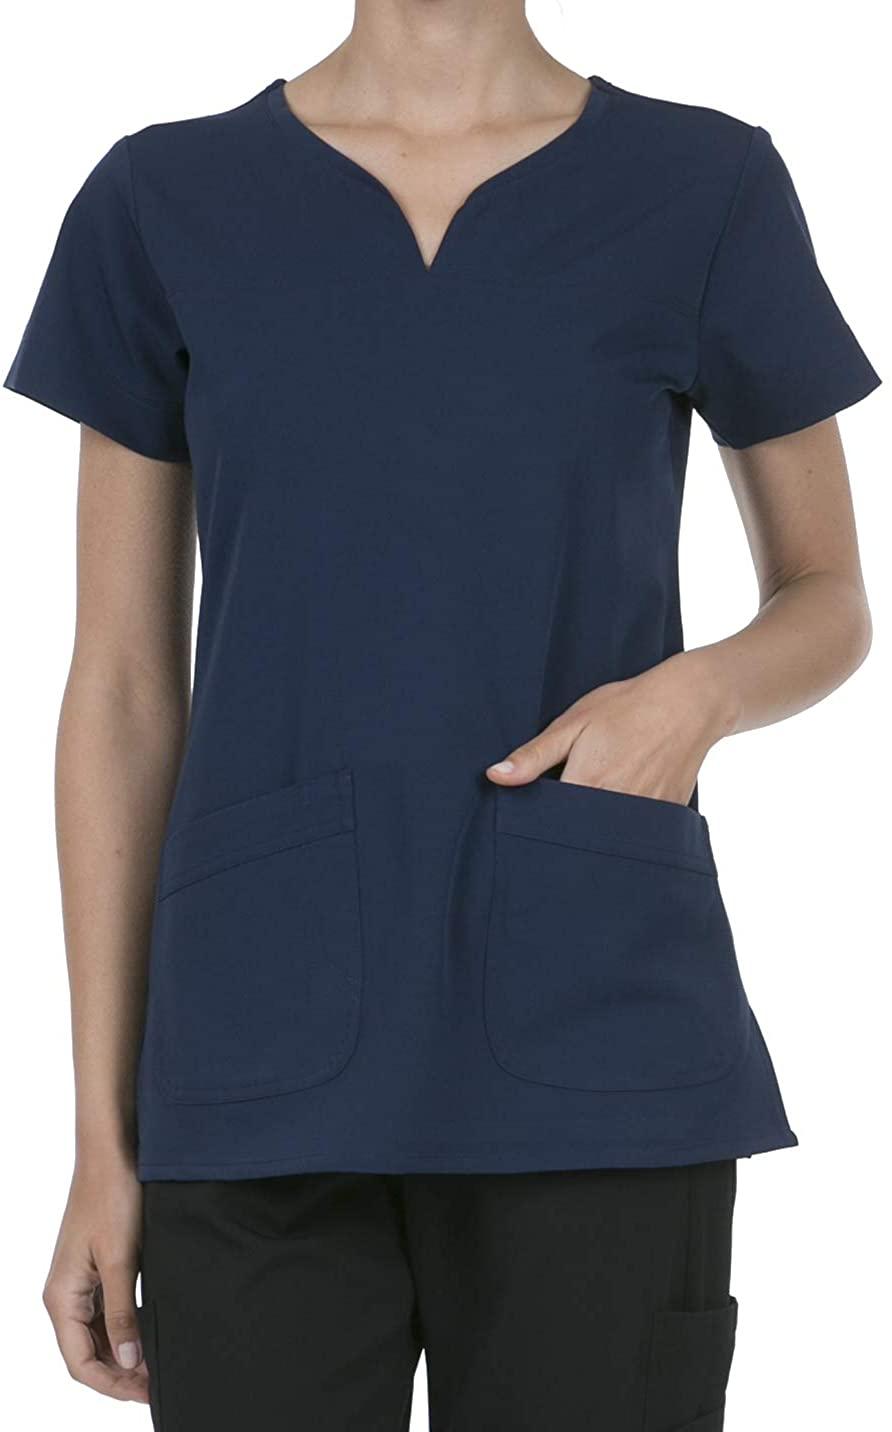 SHOP TIRZAH Women's Uniform Scrubs Medical 2 Pocket Scrub Top, Navy, Large